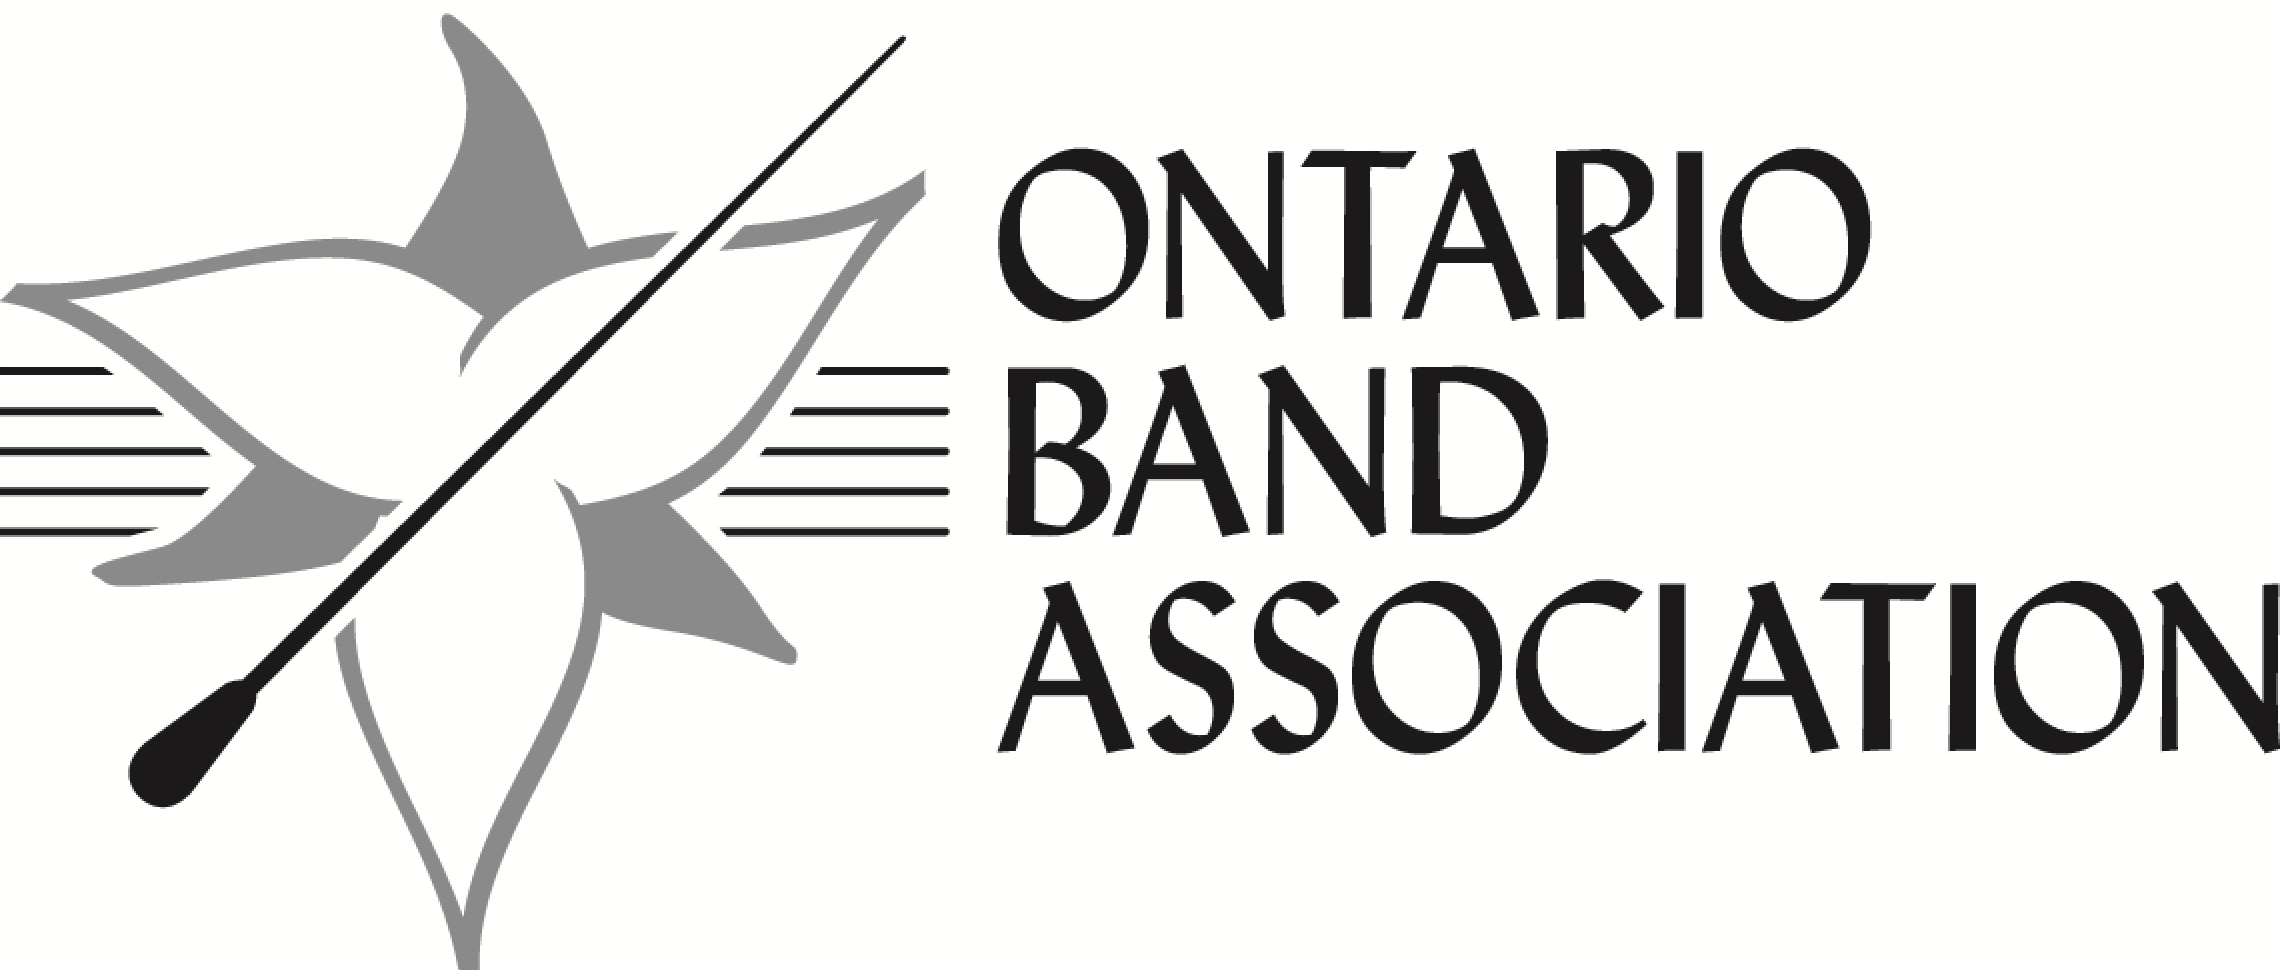 The Ontario Band Association